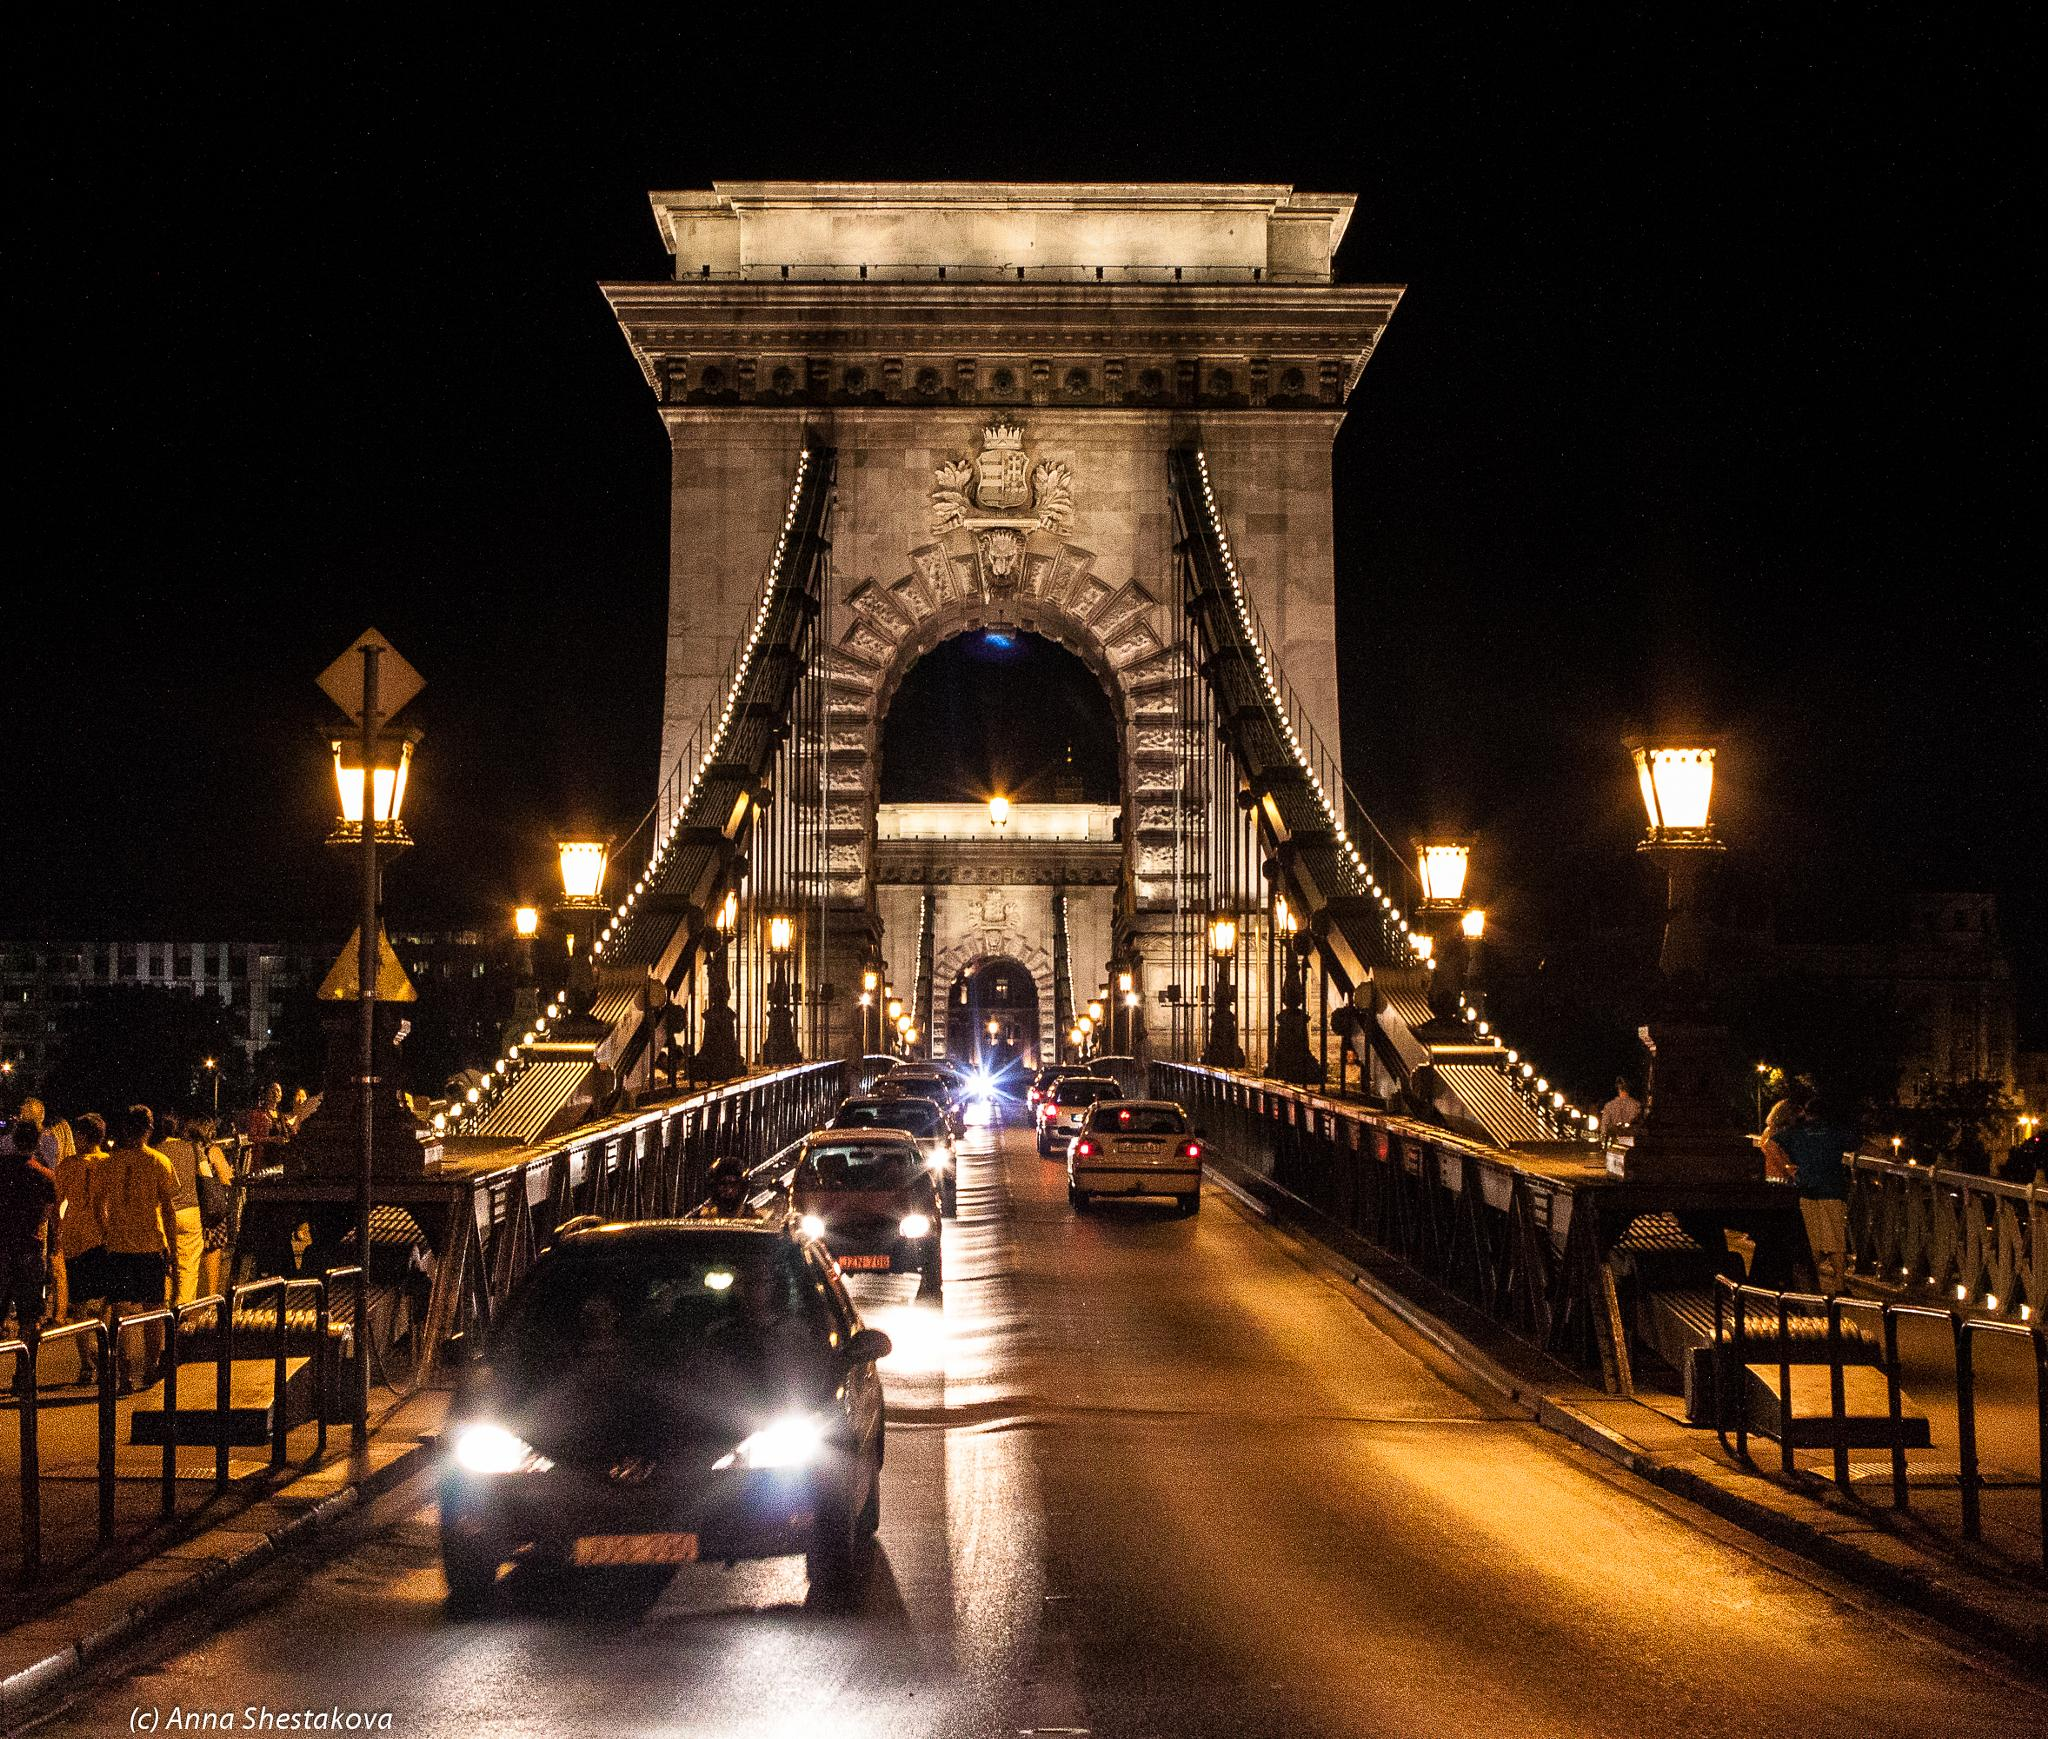 Night. Light. Bridge. by Anna Shestakova